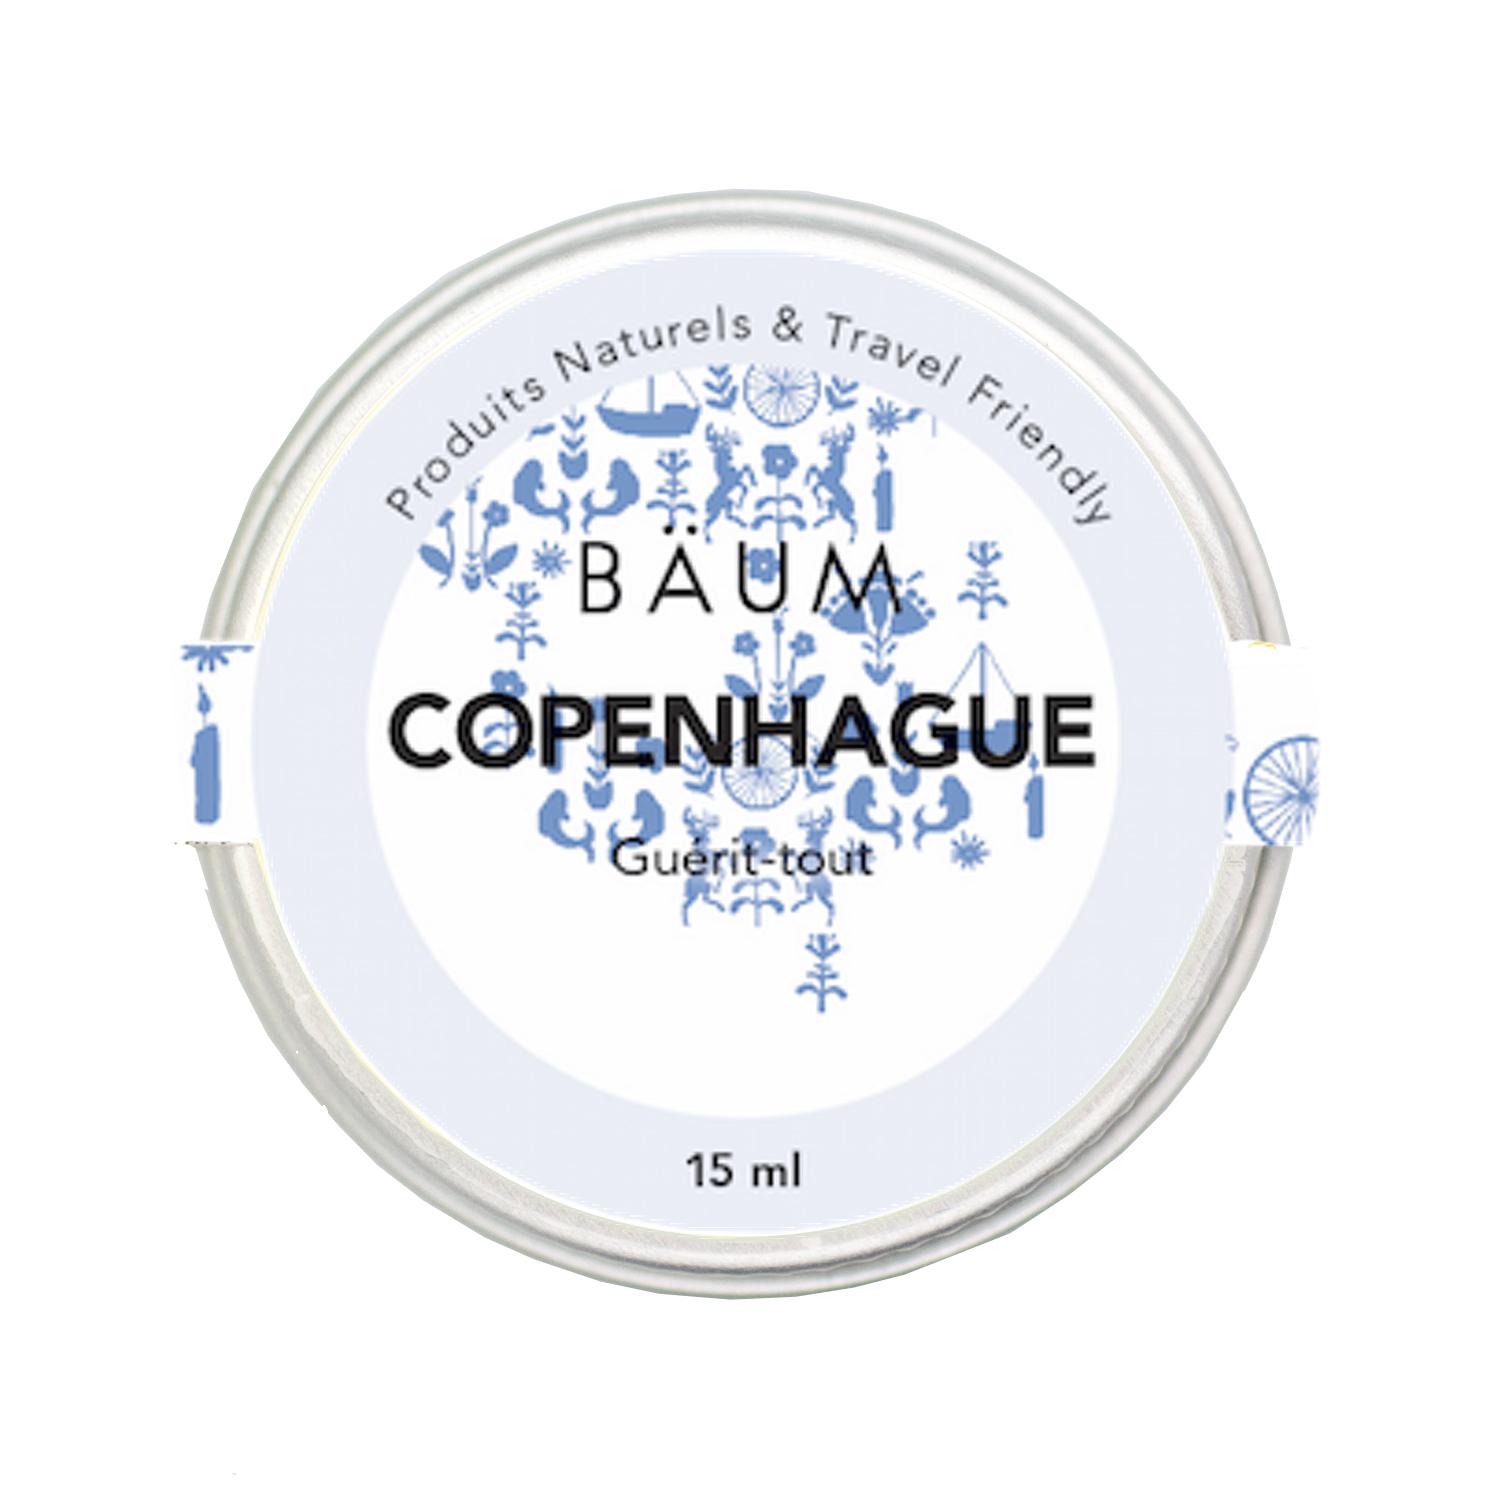 Copy of Baume Copenhague